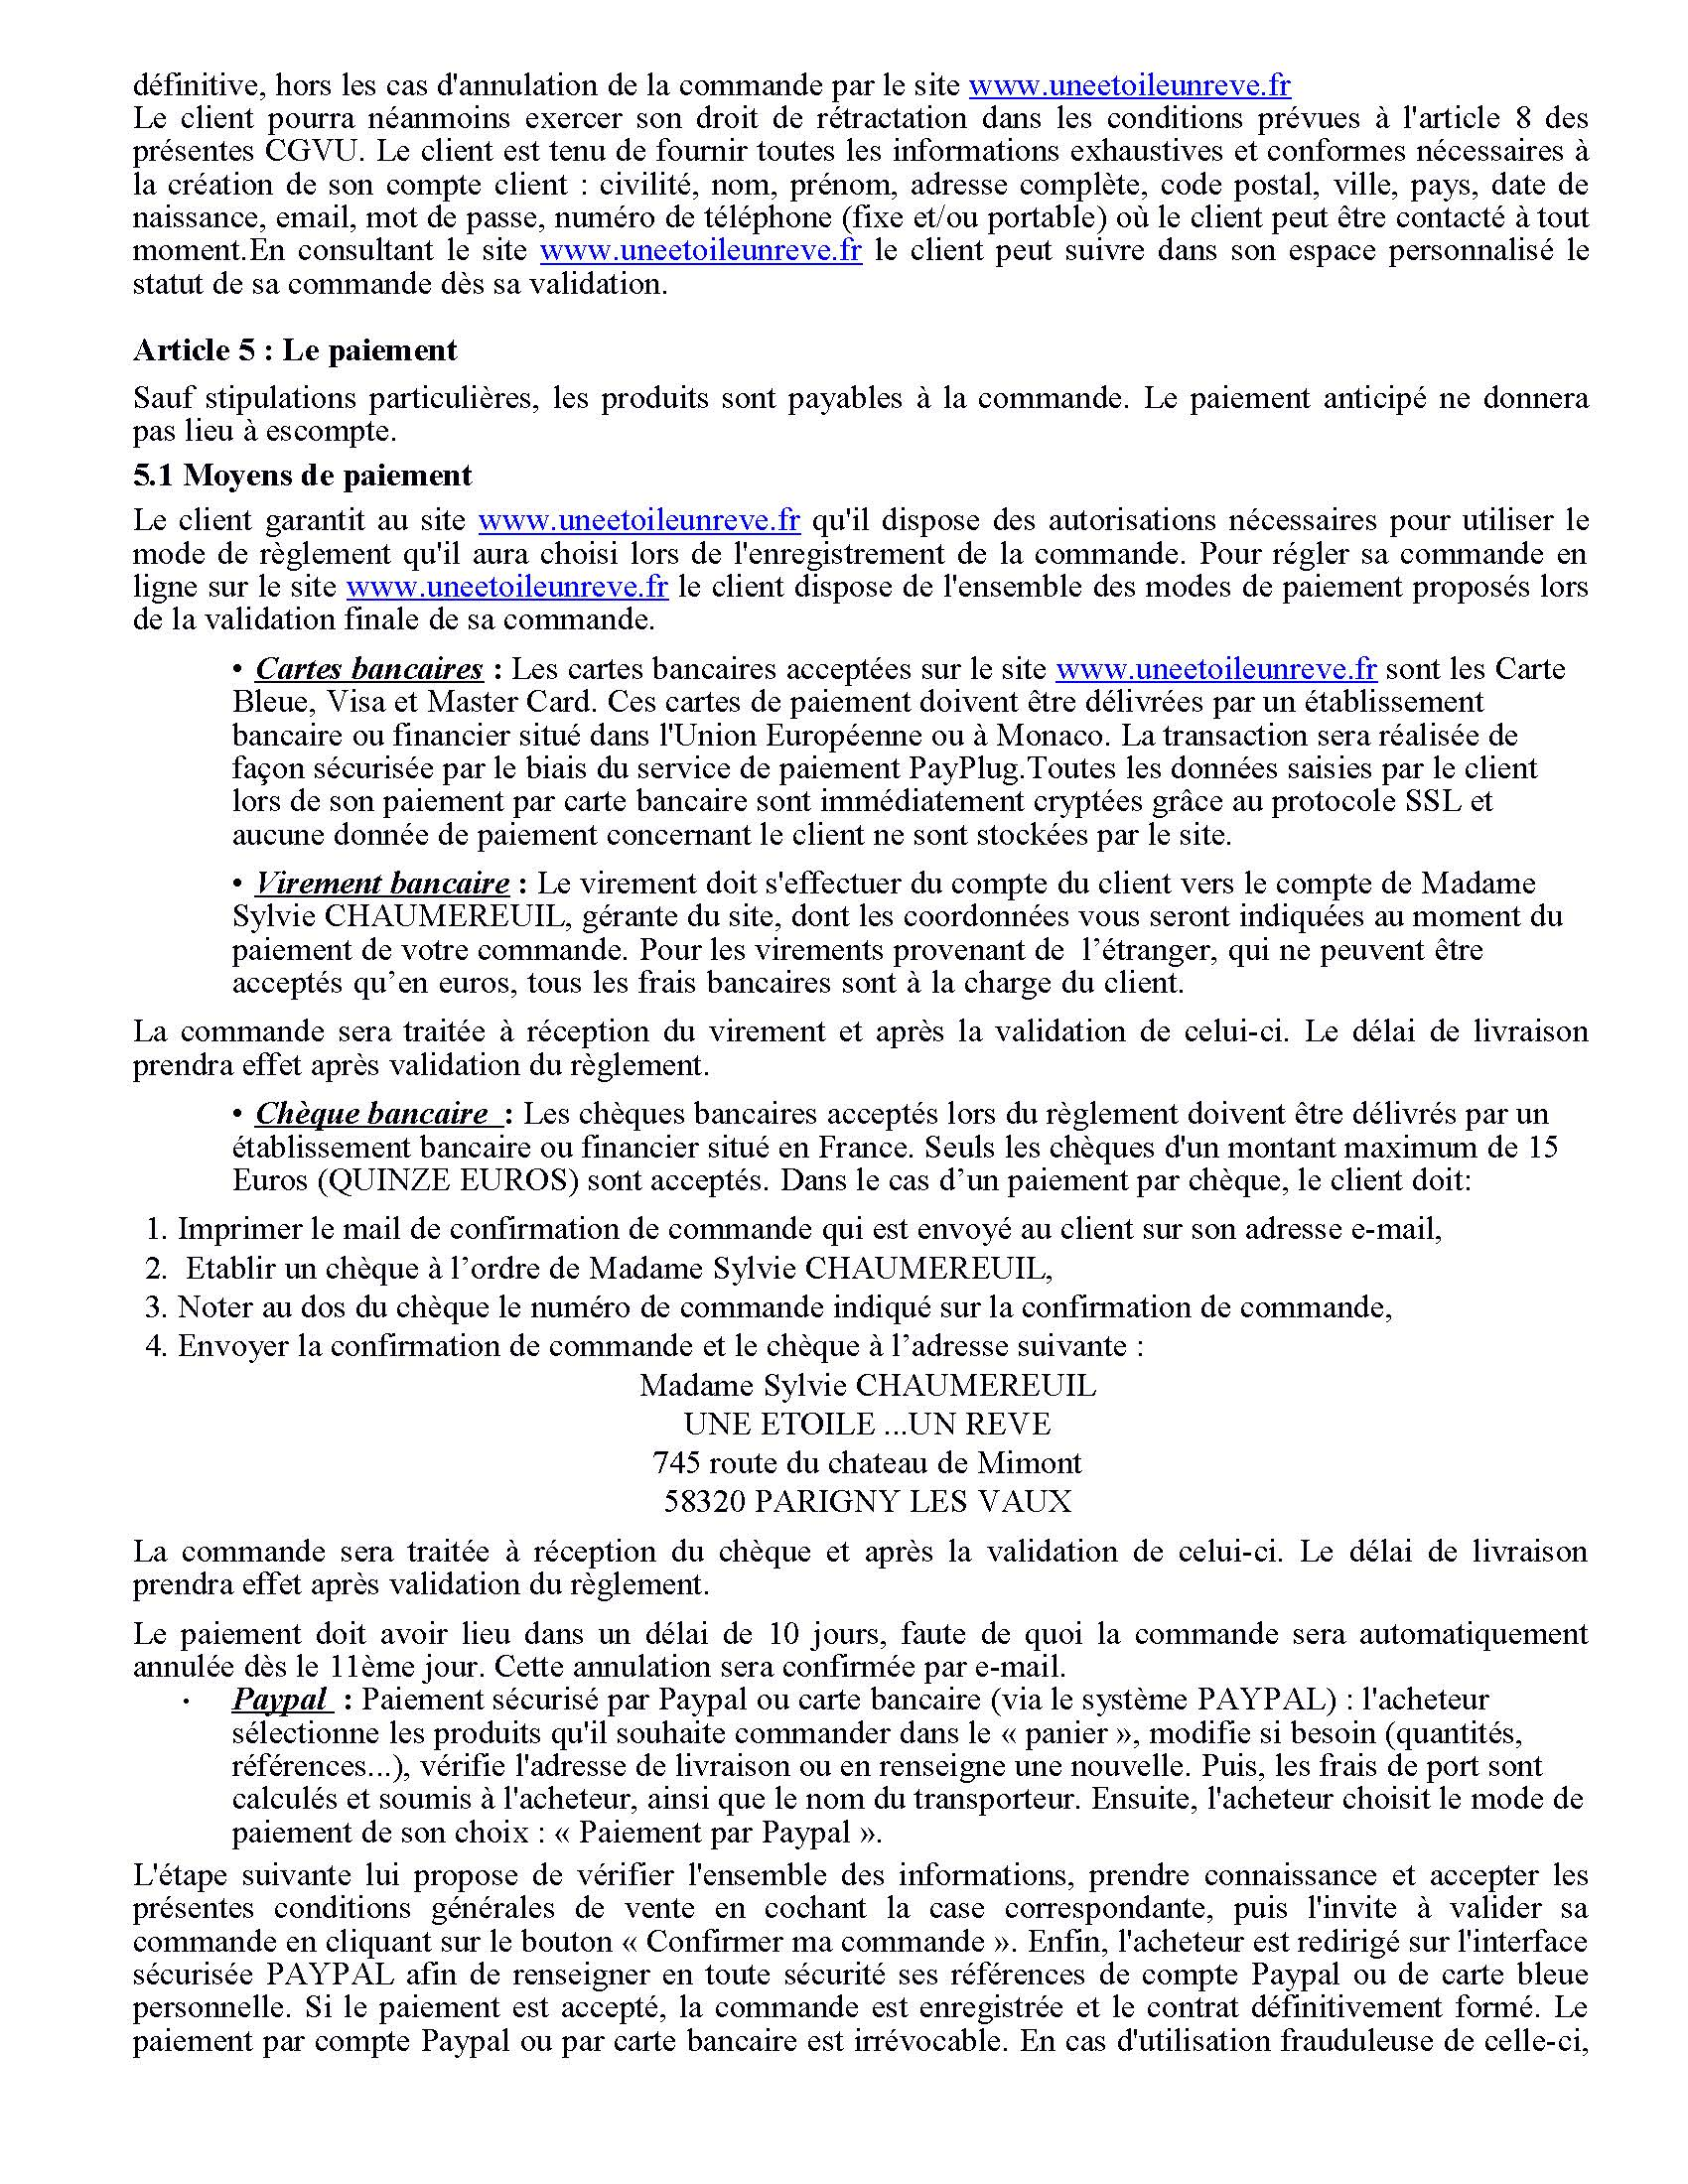 CGV_www.uneetoileunreve.fr_Page_04.jpg